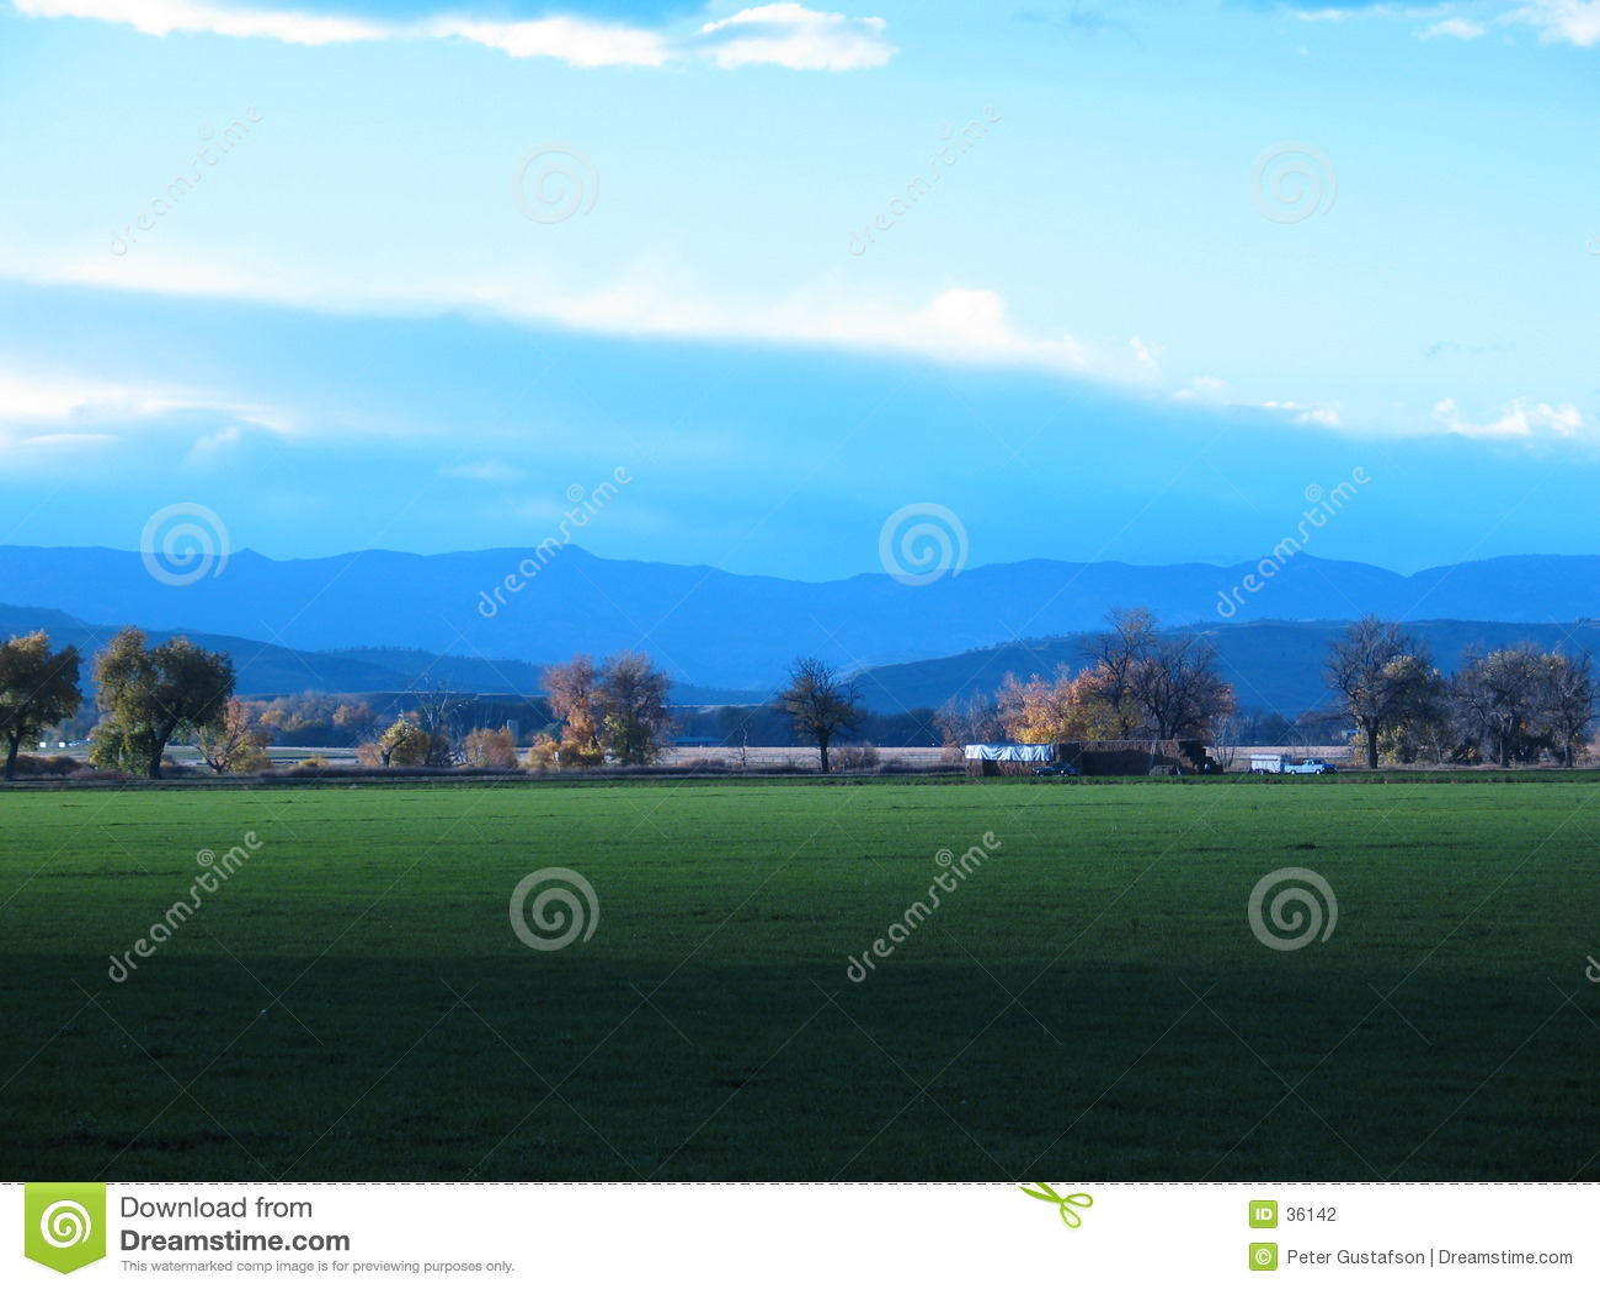 Green meadow in the fall